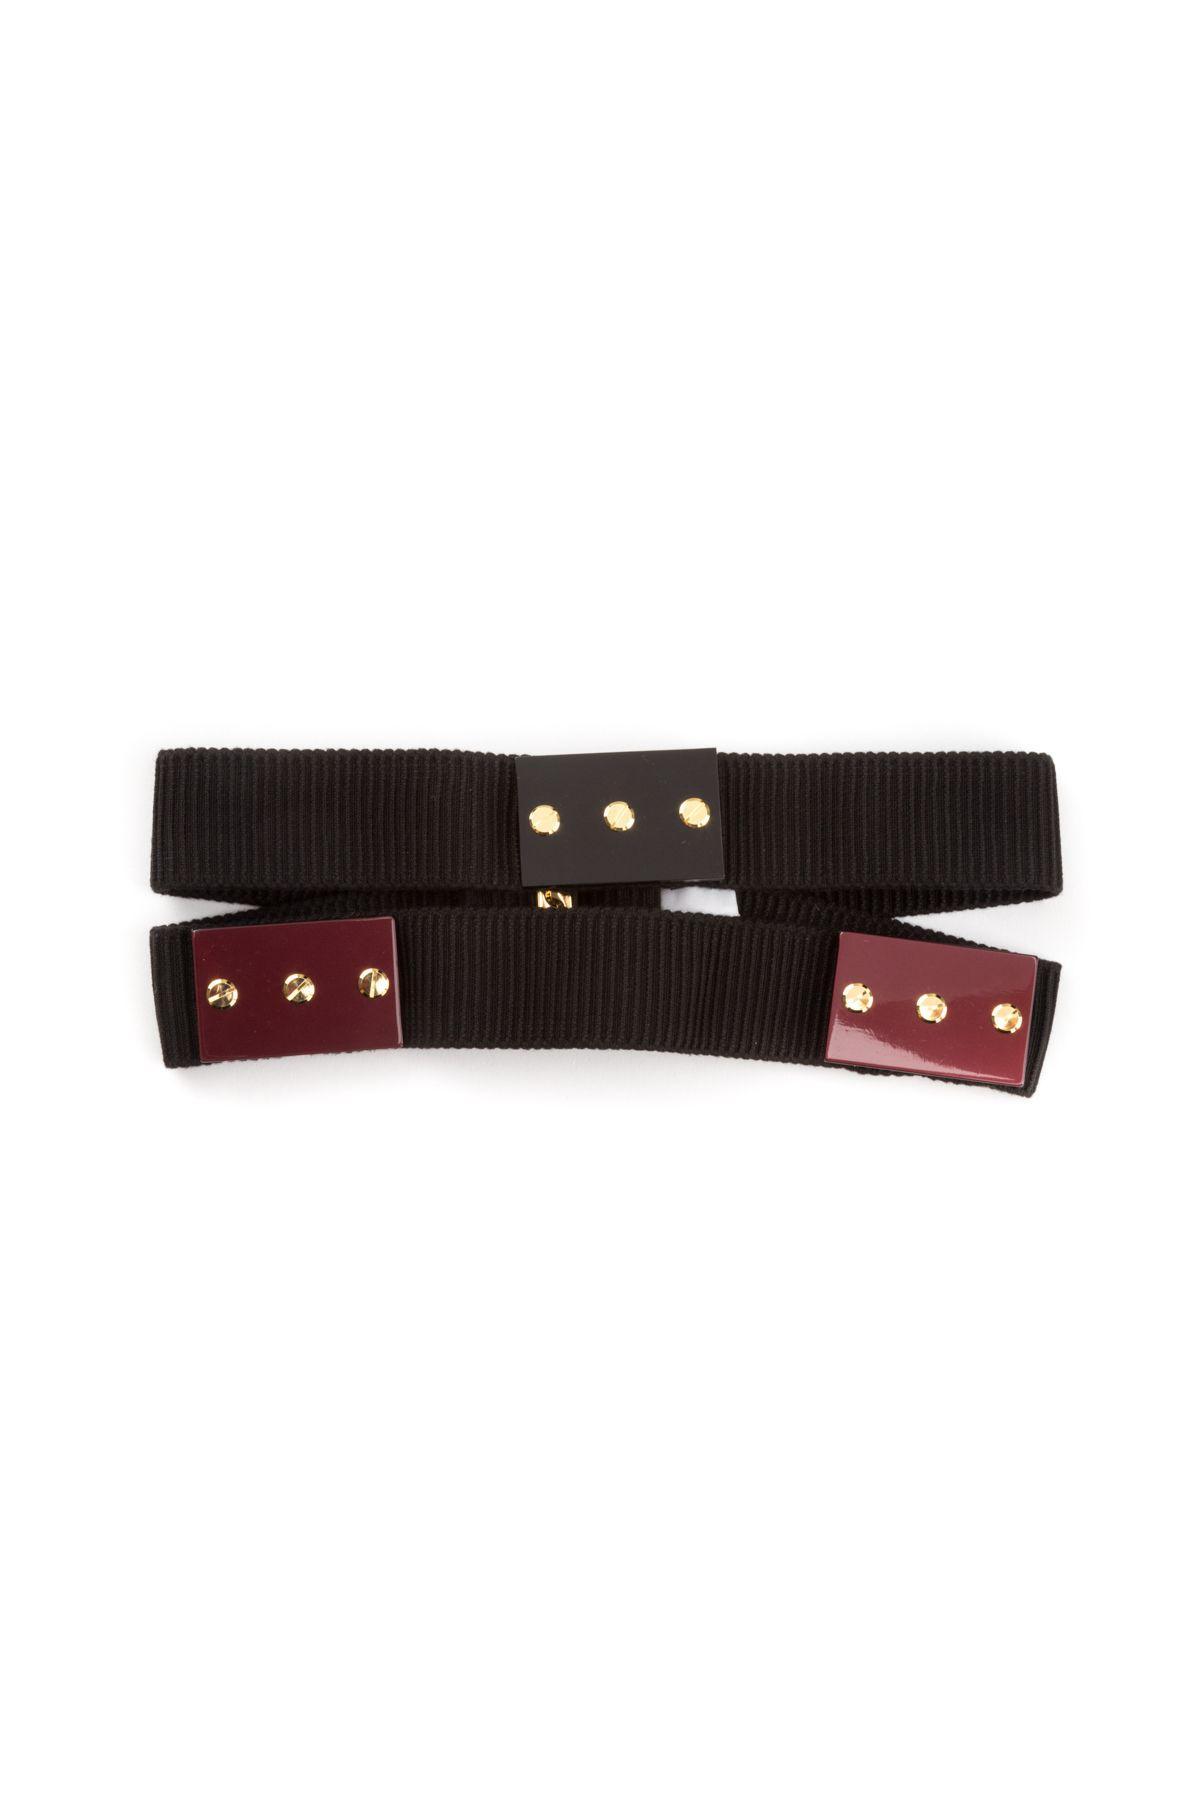 Paolo Errico Elastic Belt In Black-bordeauxnero